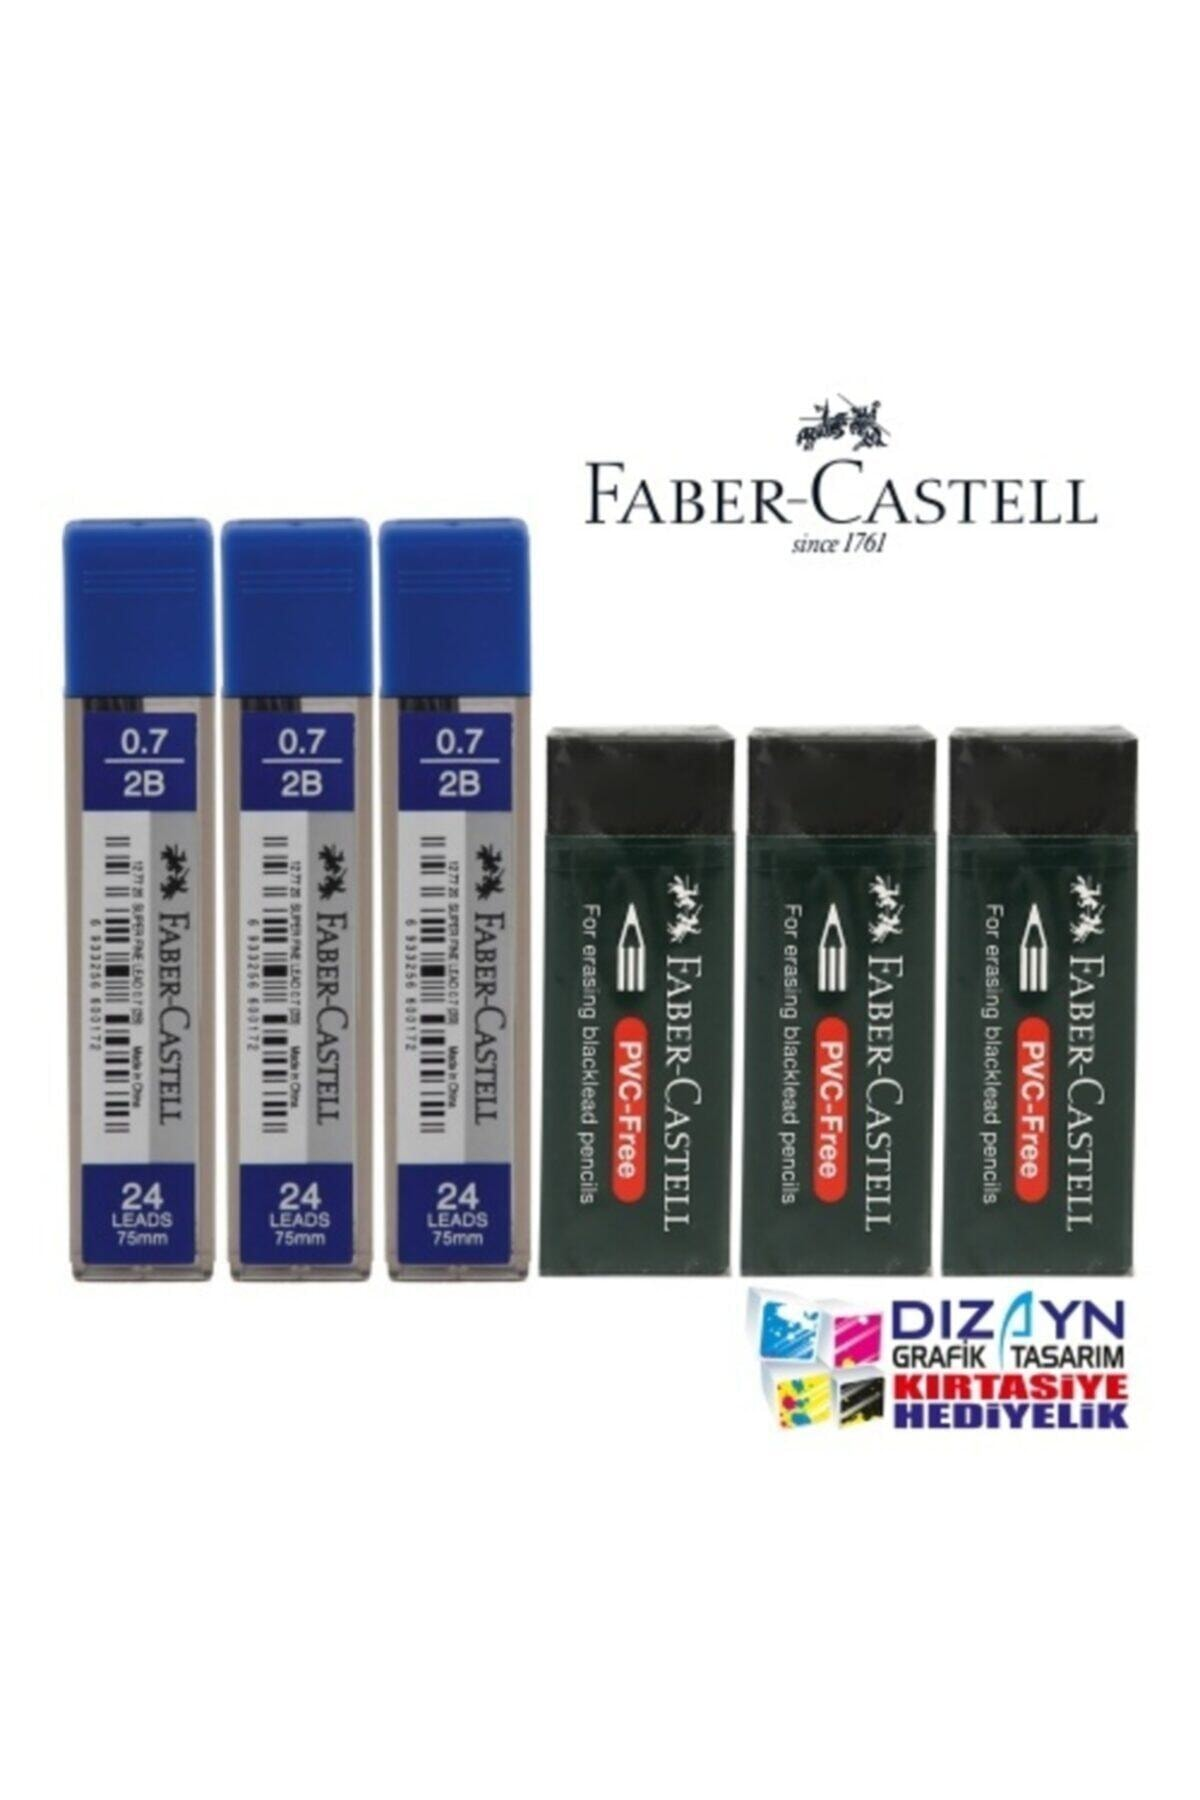 Faber Castell 3 Adet 0,7 Min 2b + 3 Adet Büyük Siyah Silgi Set 1